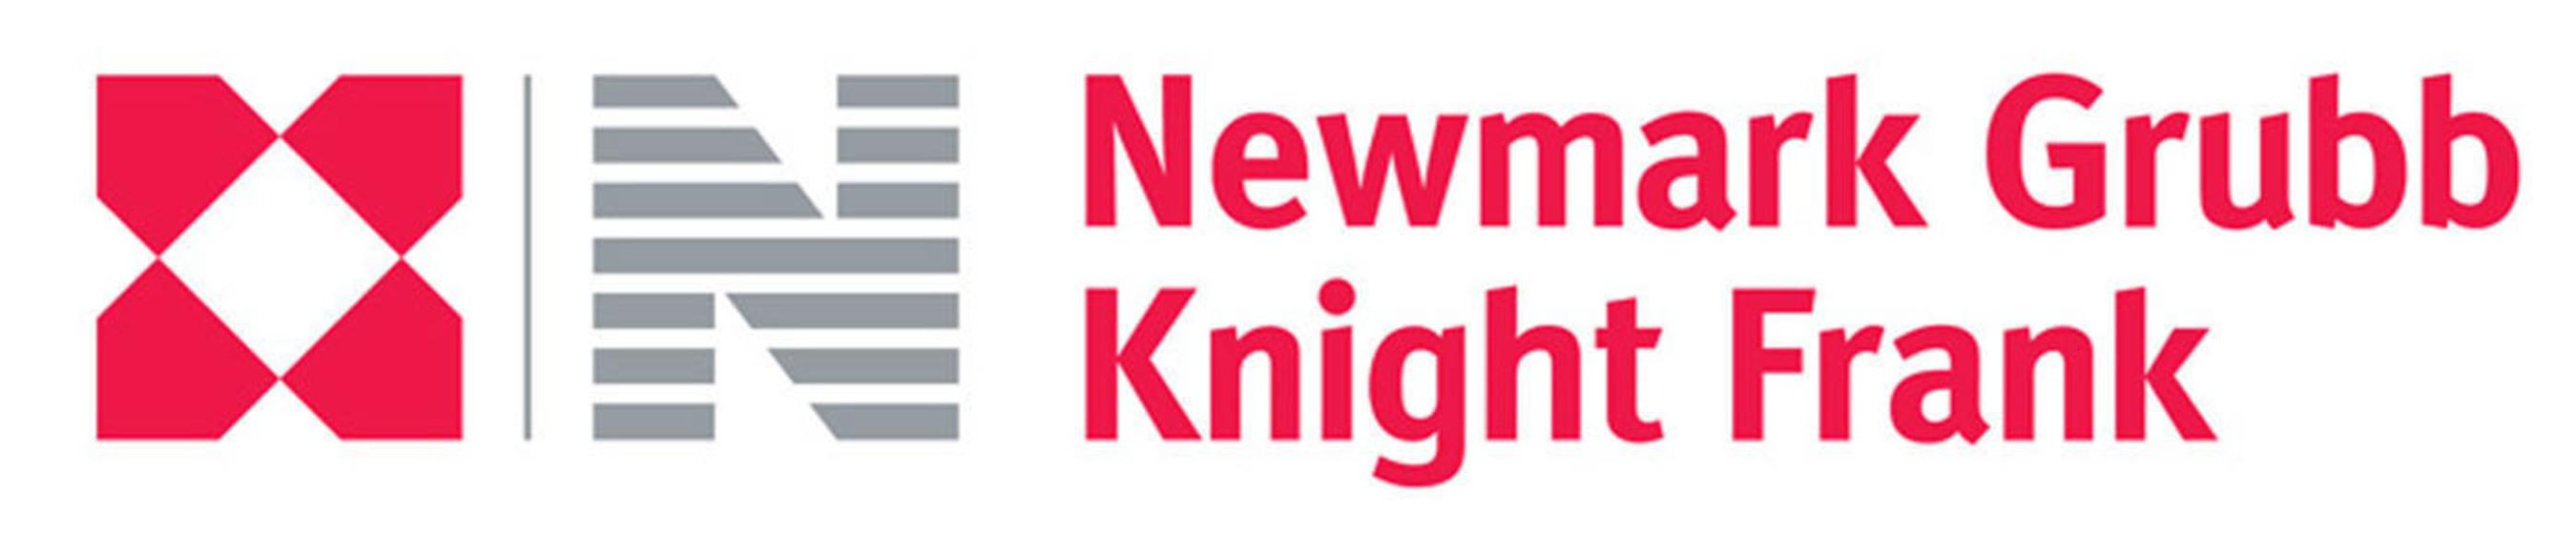 Newmark Grubb Knight Frank logo.